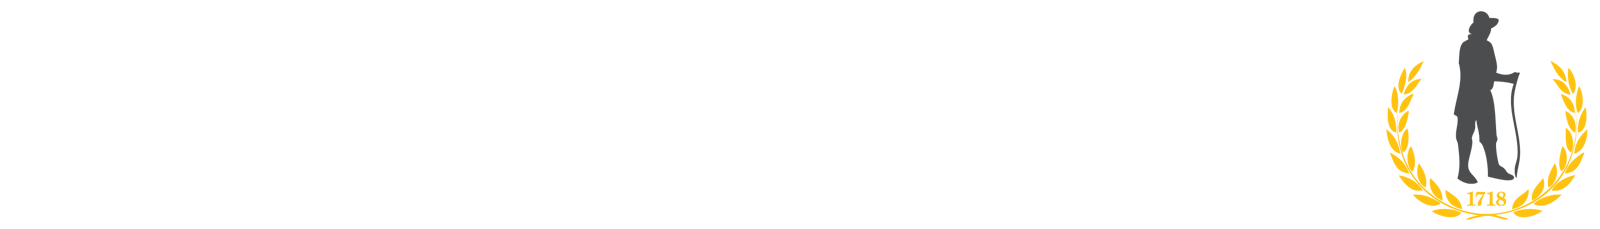 Robert-Wilkinson-Primary-Academy-Logo-